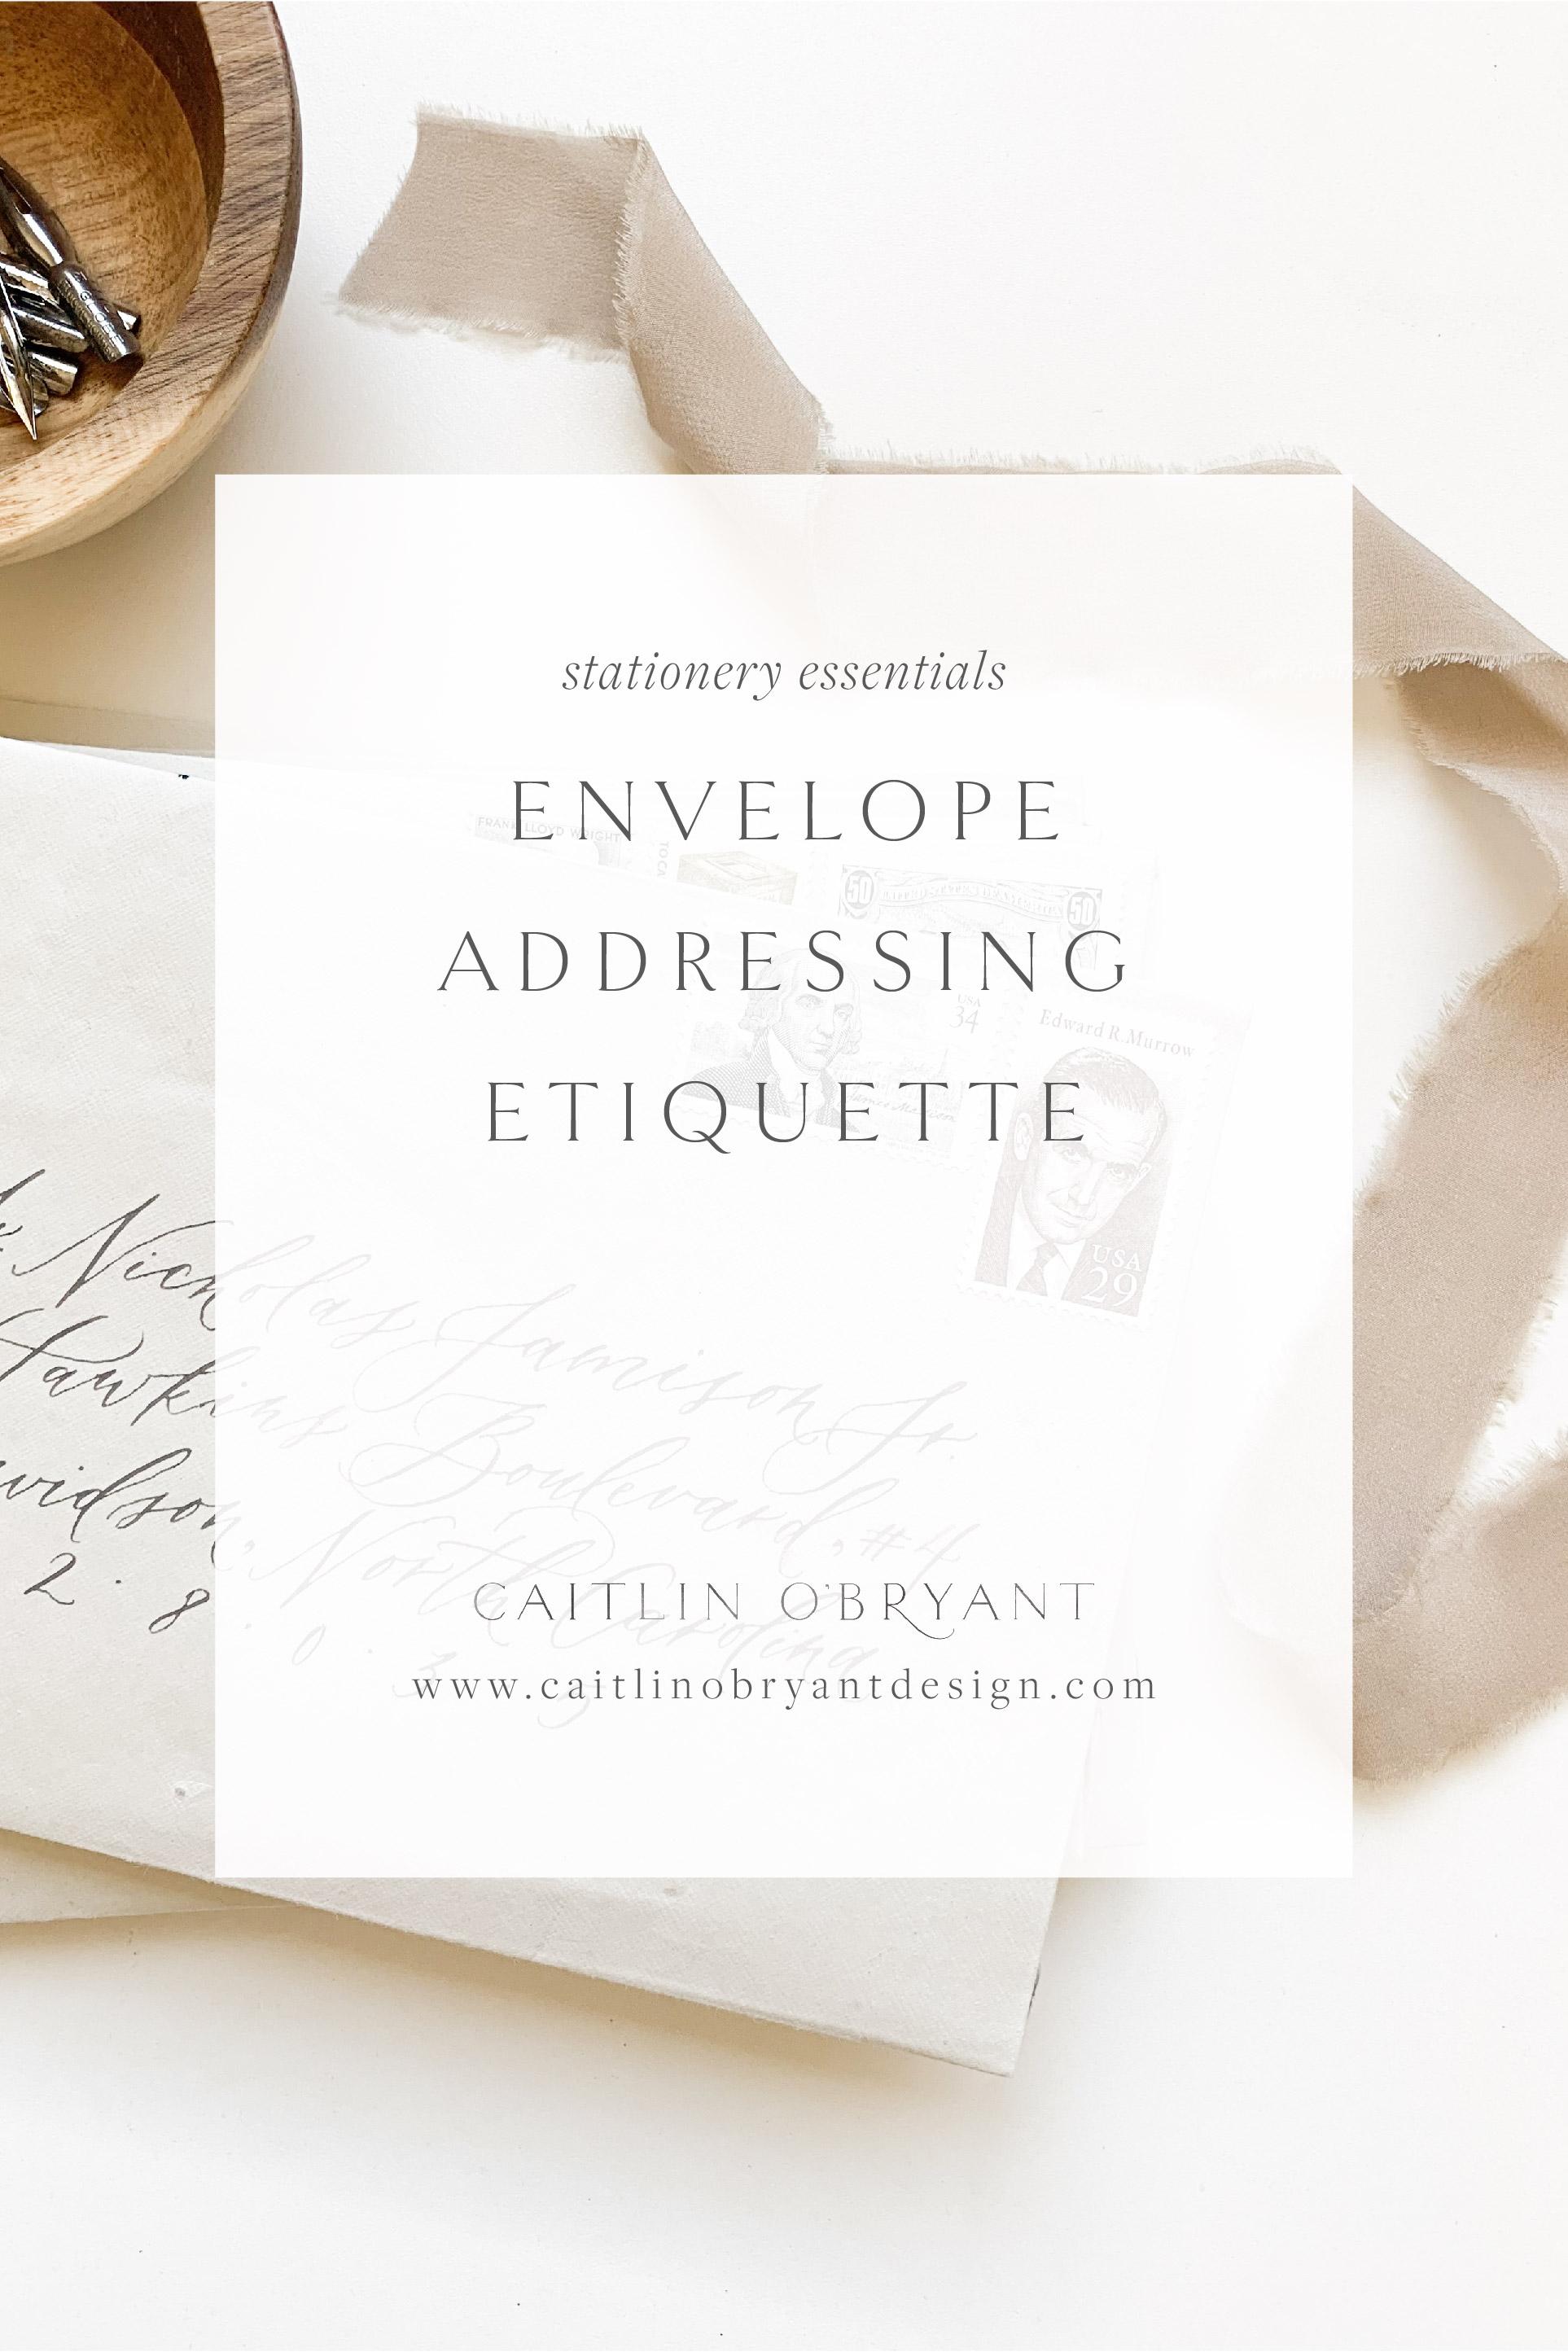 Envelope addressing etiquette for weddings. Formal and informal wedding invitation etiquette